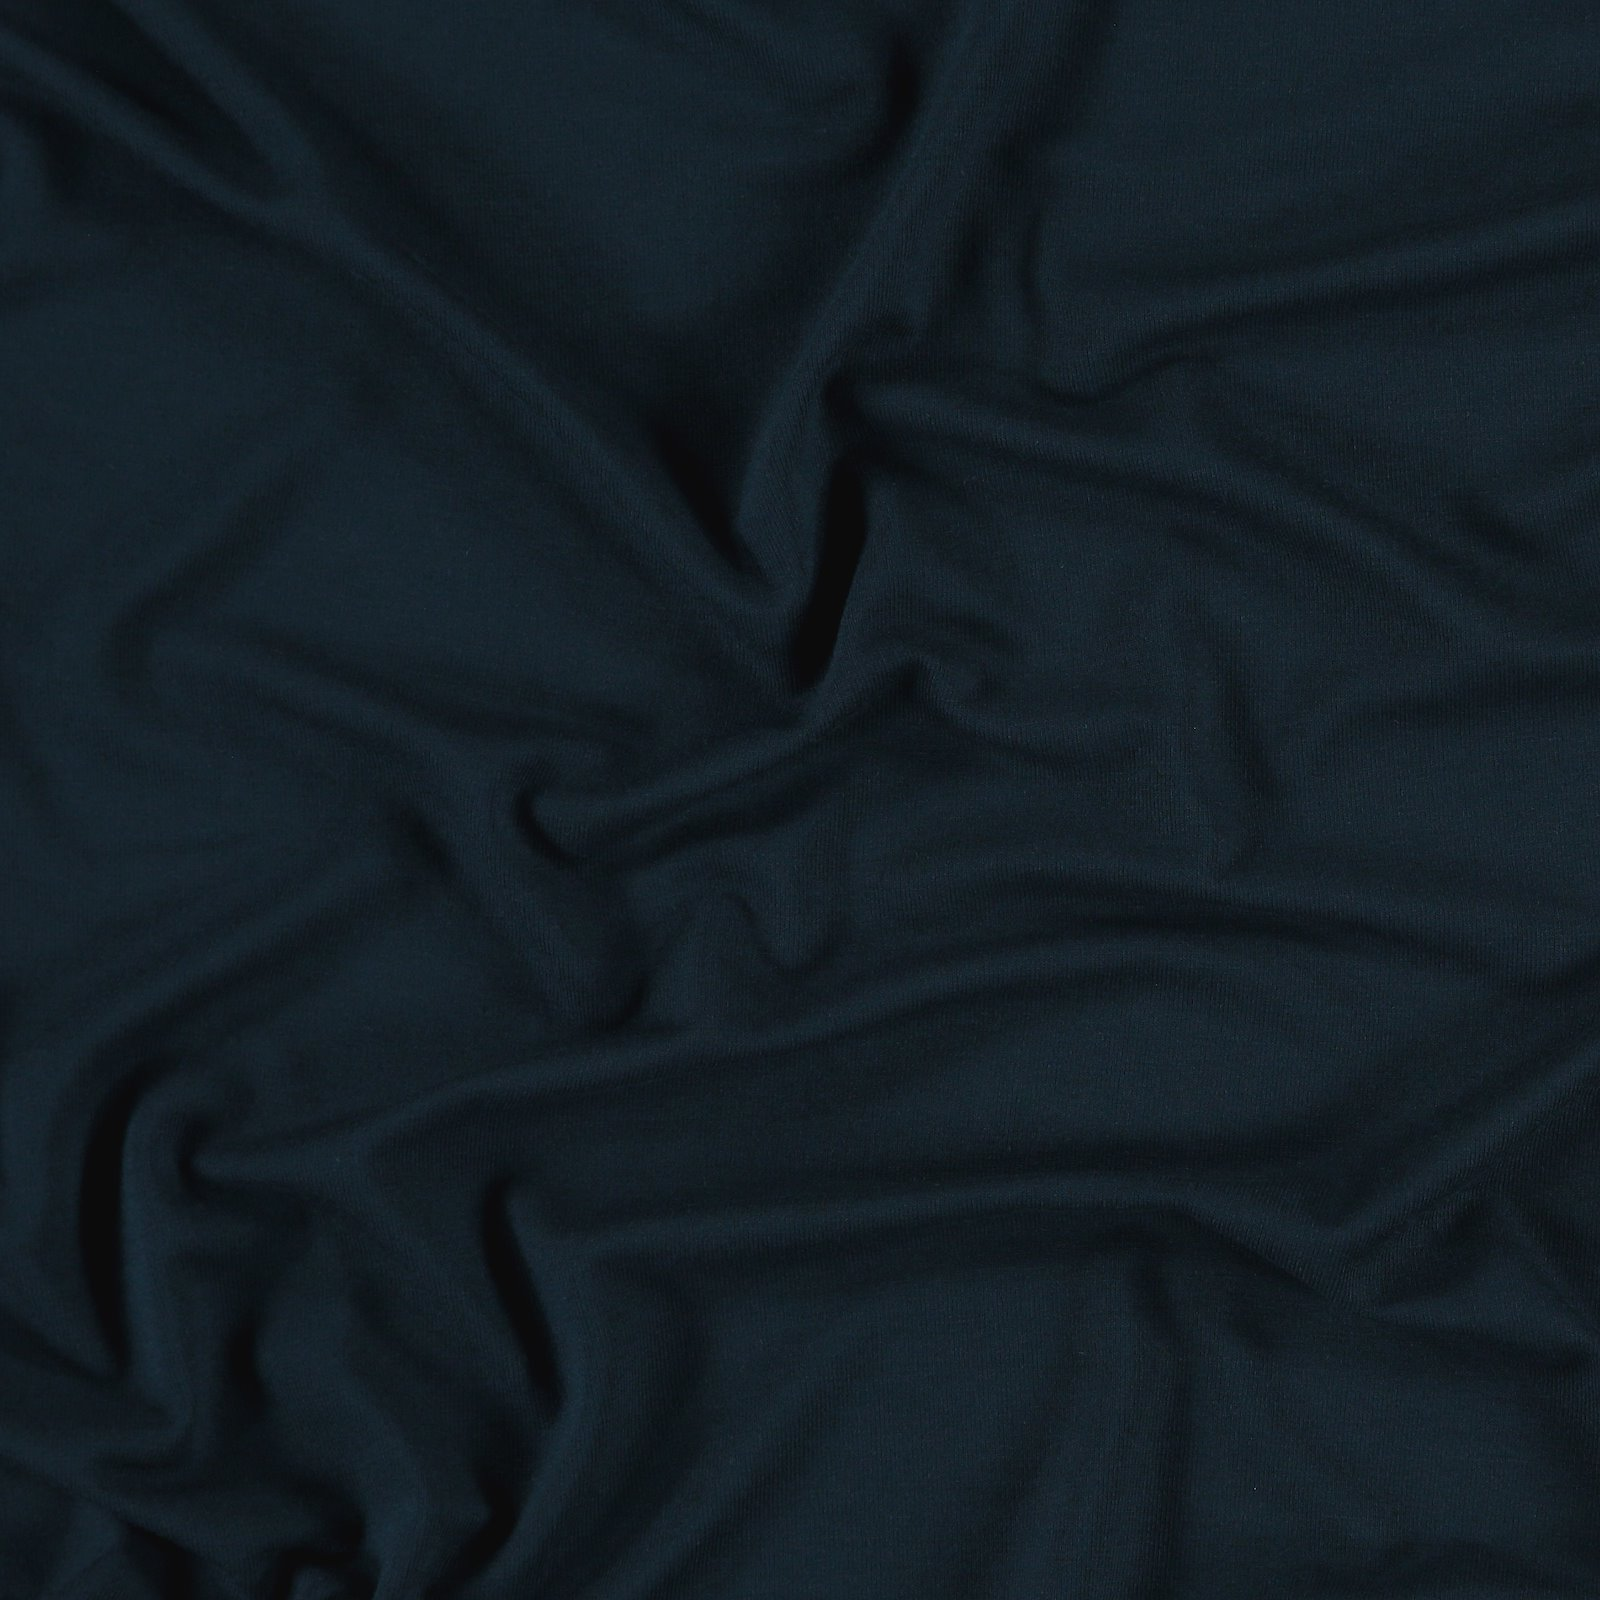 Viscose jersey navy 270413_pack